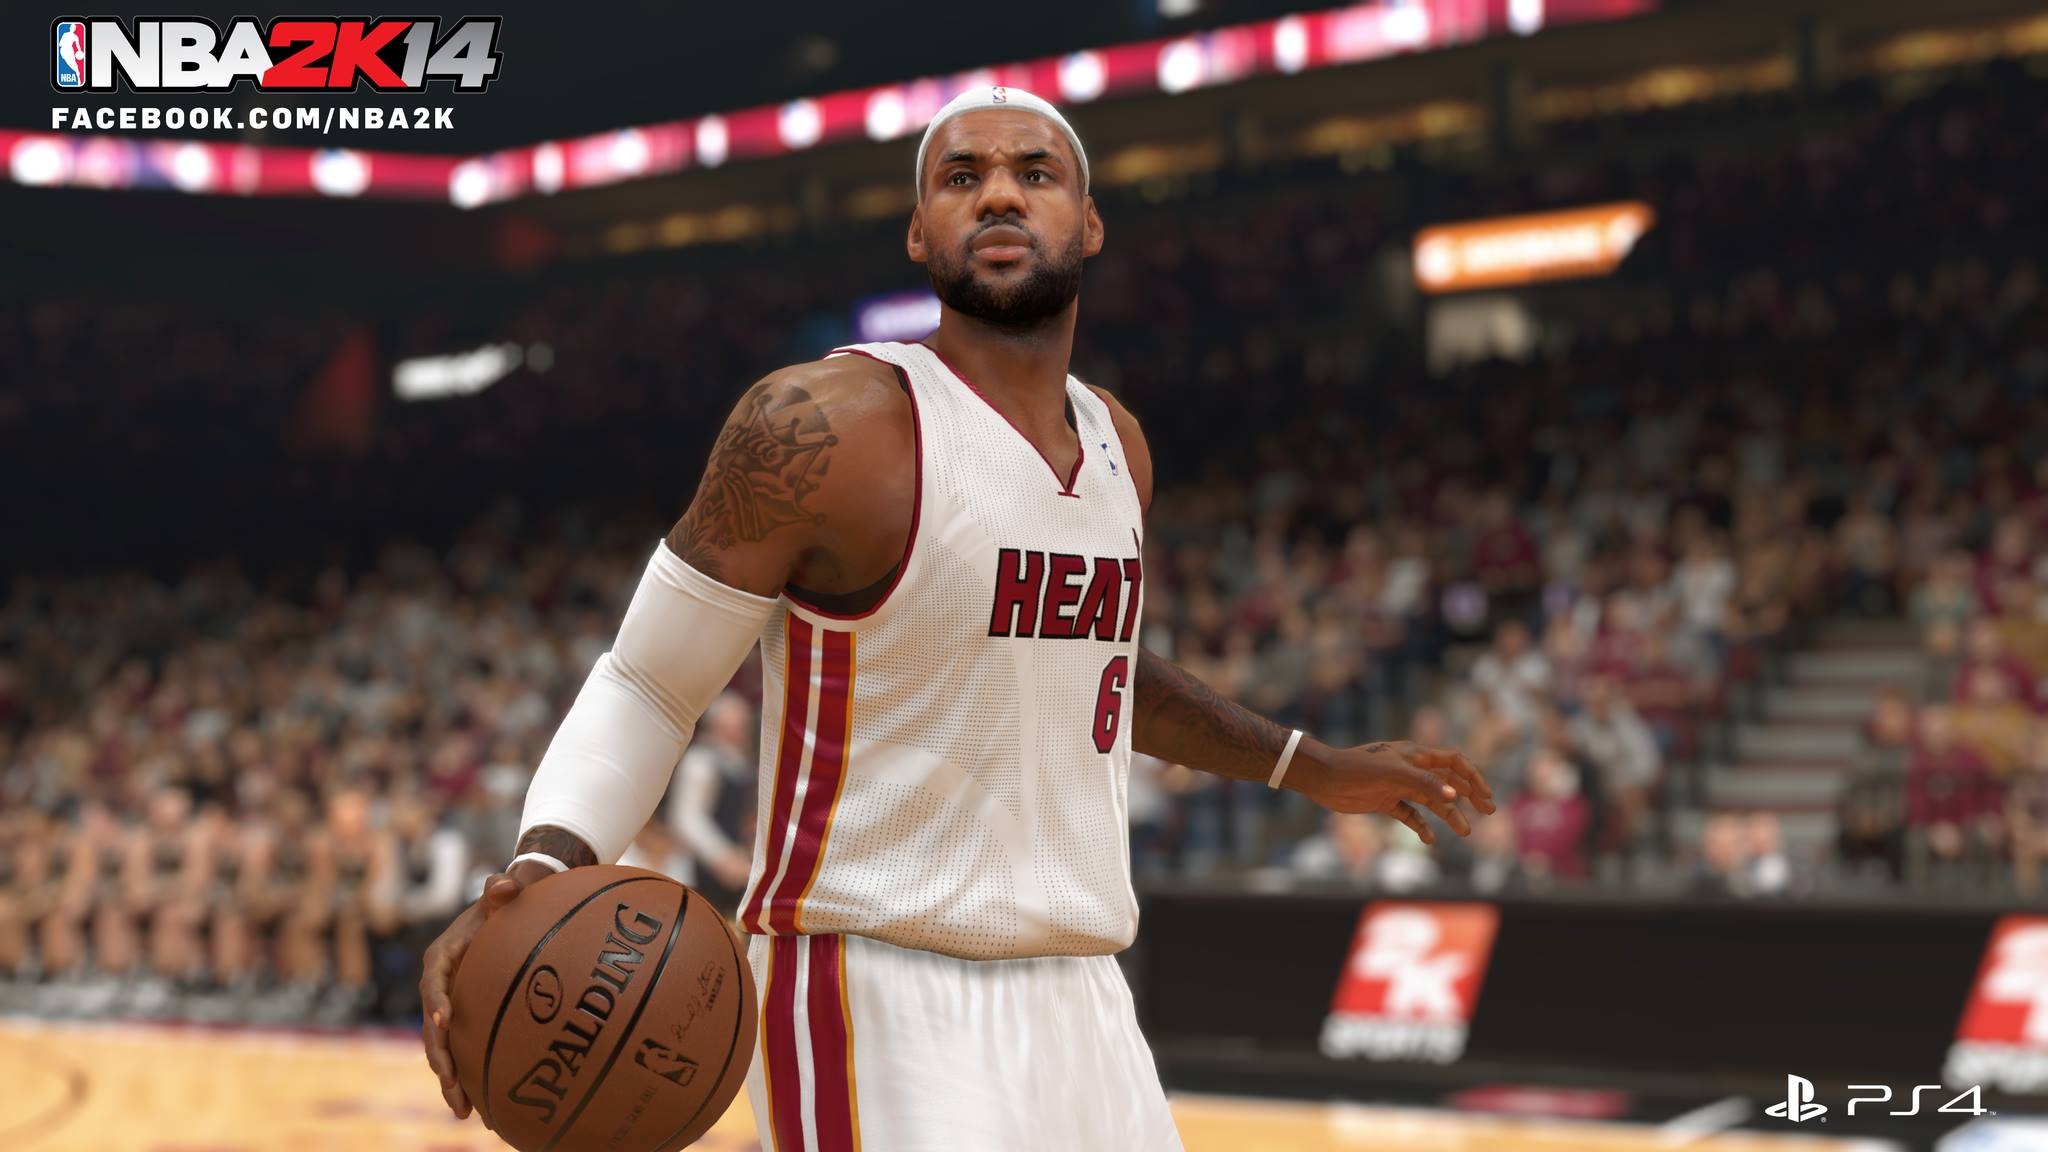 2K Is Shutting Down NBA 2K14 Online Servers Wont Affect